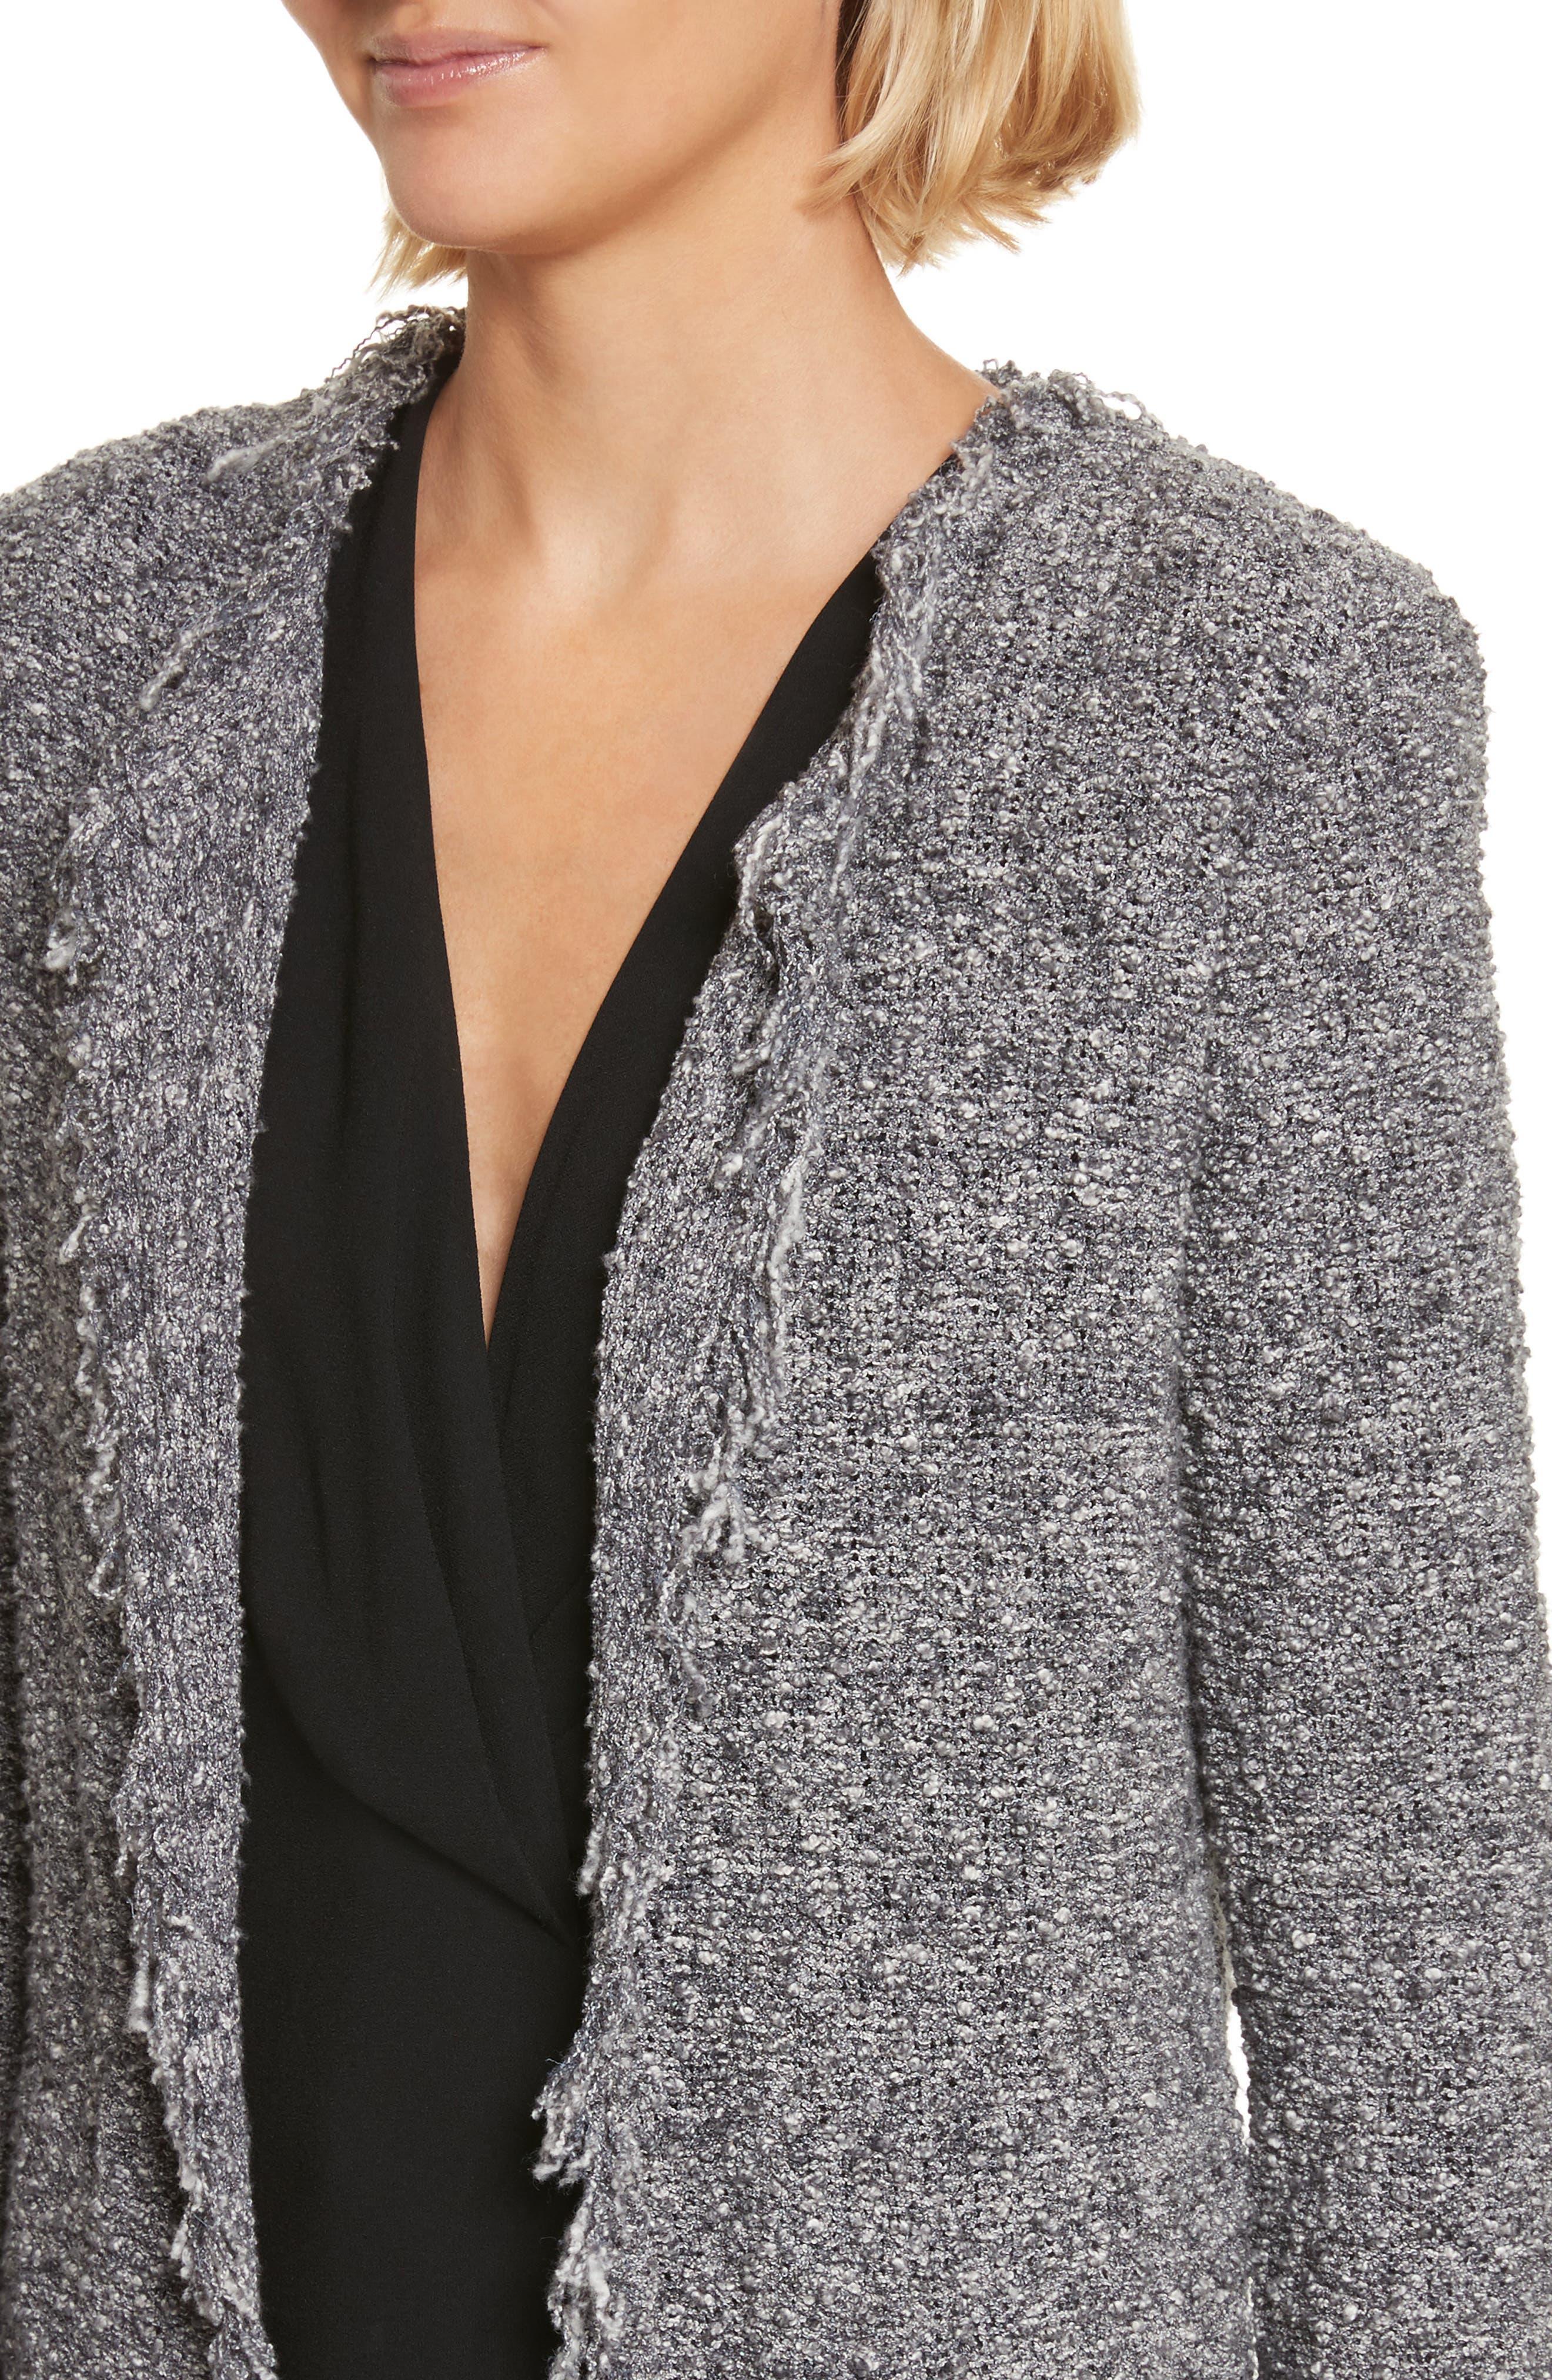 Shavanix Tweed Jacket,                             Alternate thumbnail 4, color,                             Dark Grey